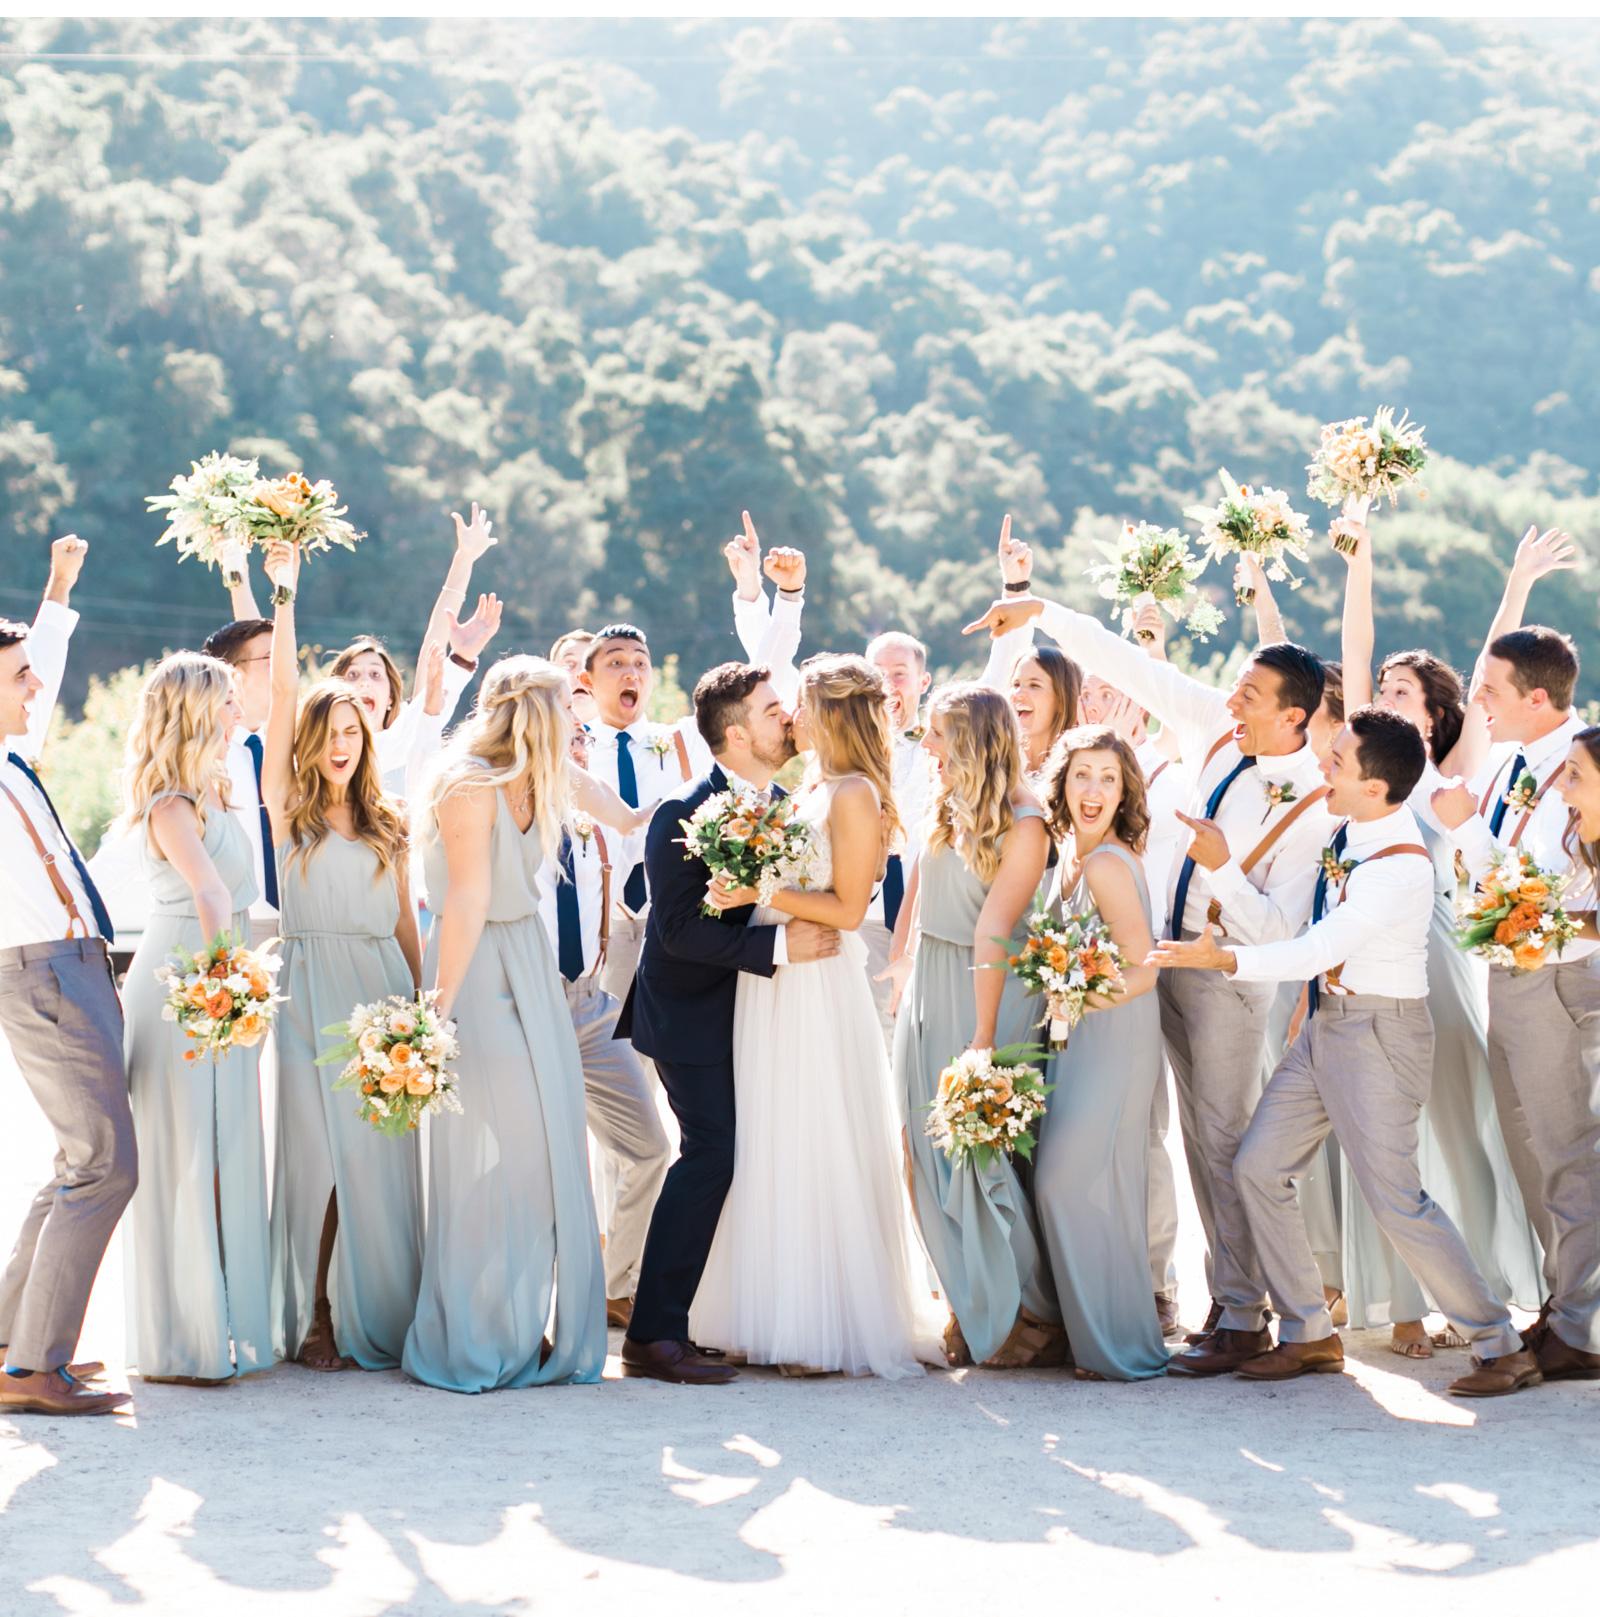 Style-Me-Pretty-San-Luis-Obispo-Wedding-Natalie-Schutt-Photography_13.jpg